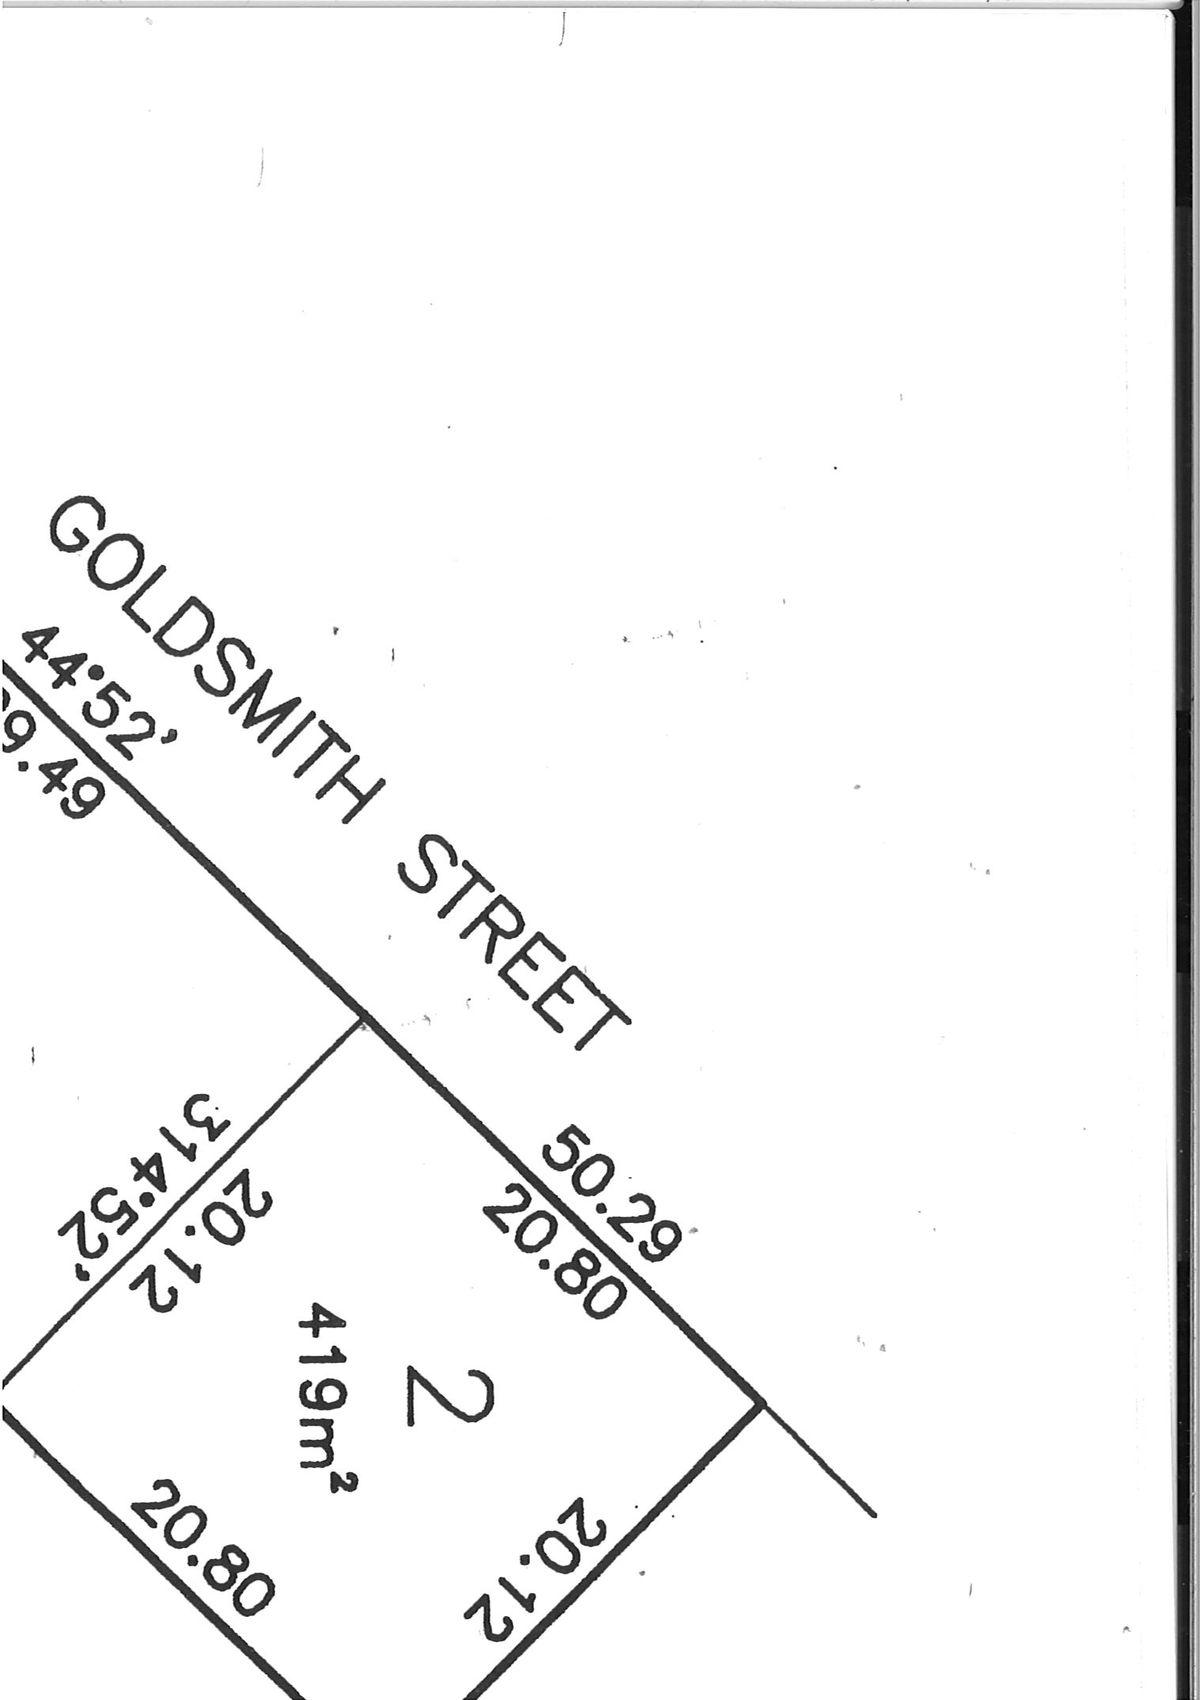 78A Goldsmith Street, Maryborough, VIC 3465